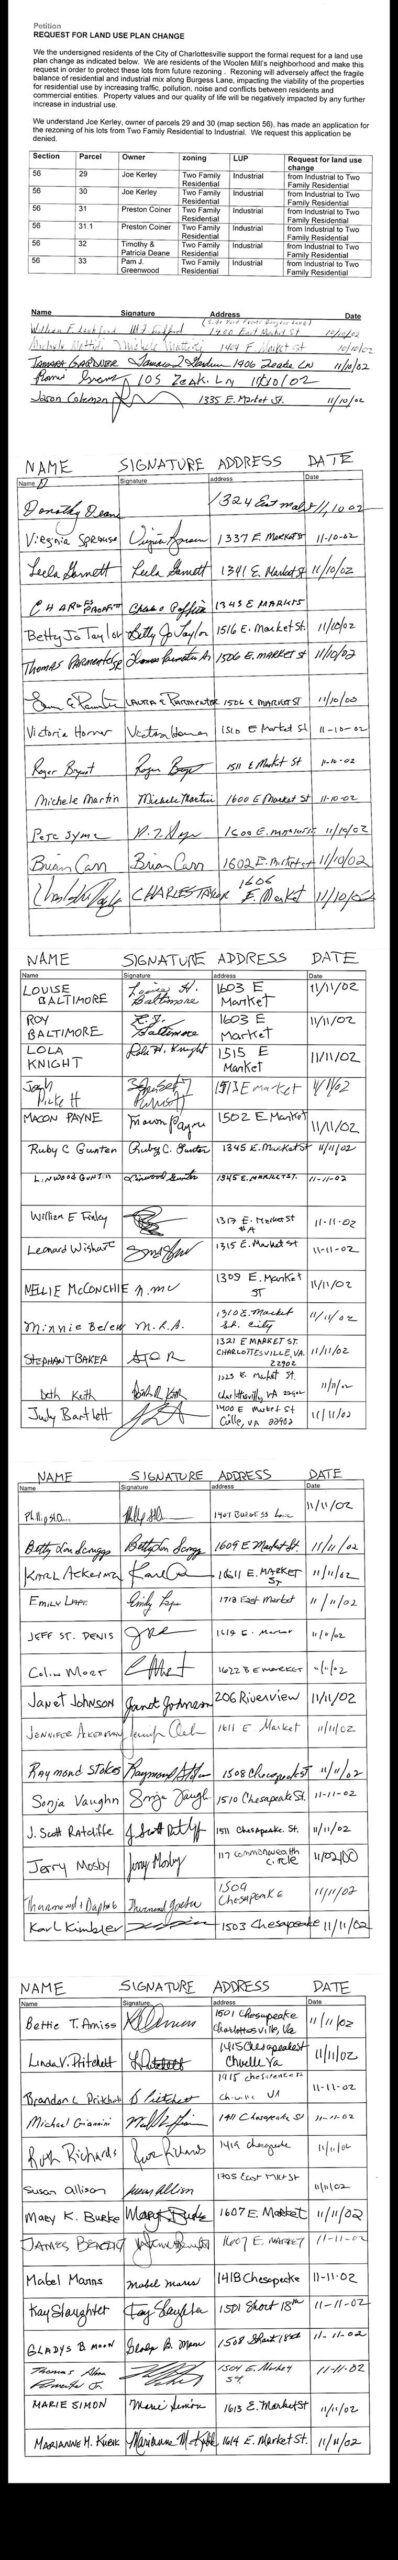 2002 Land Use Plan petition